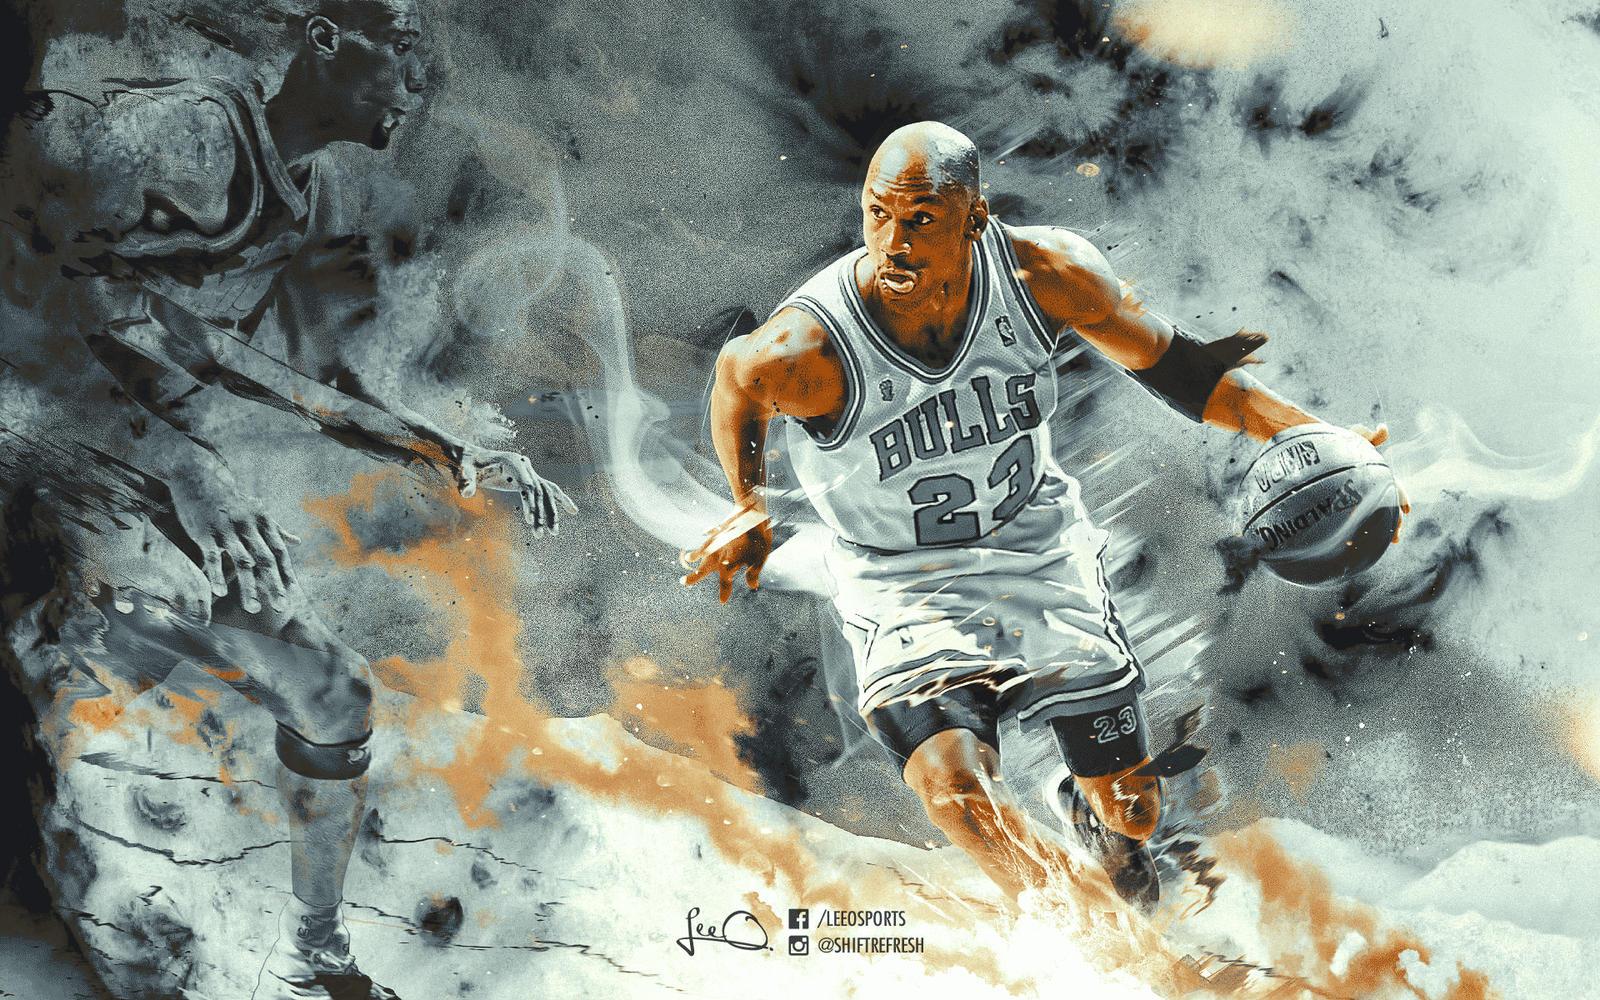 Michael Jordan Abstract Wallpaper By Skythlee On DeviantArt